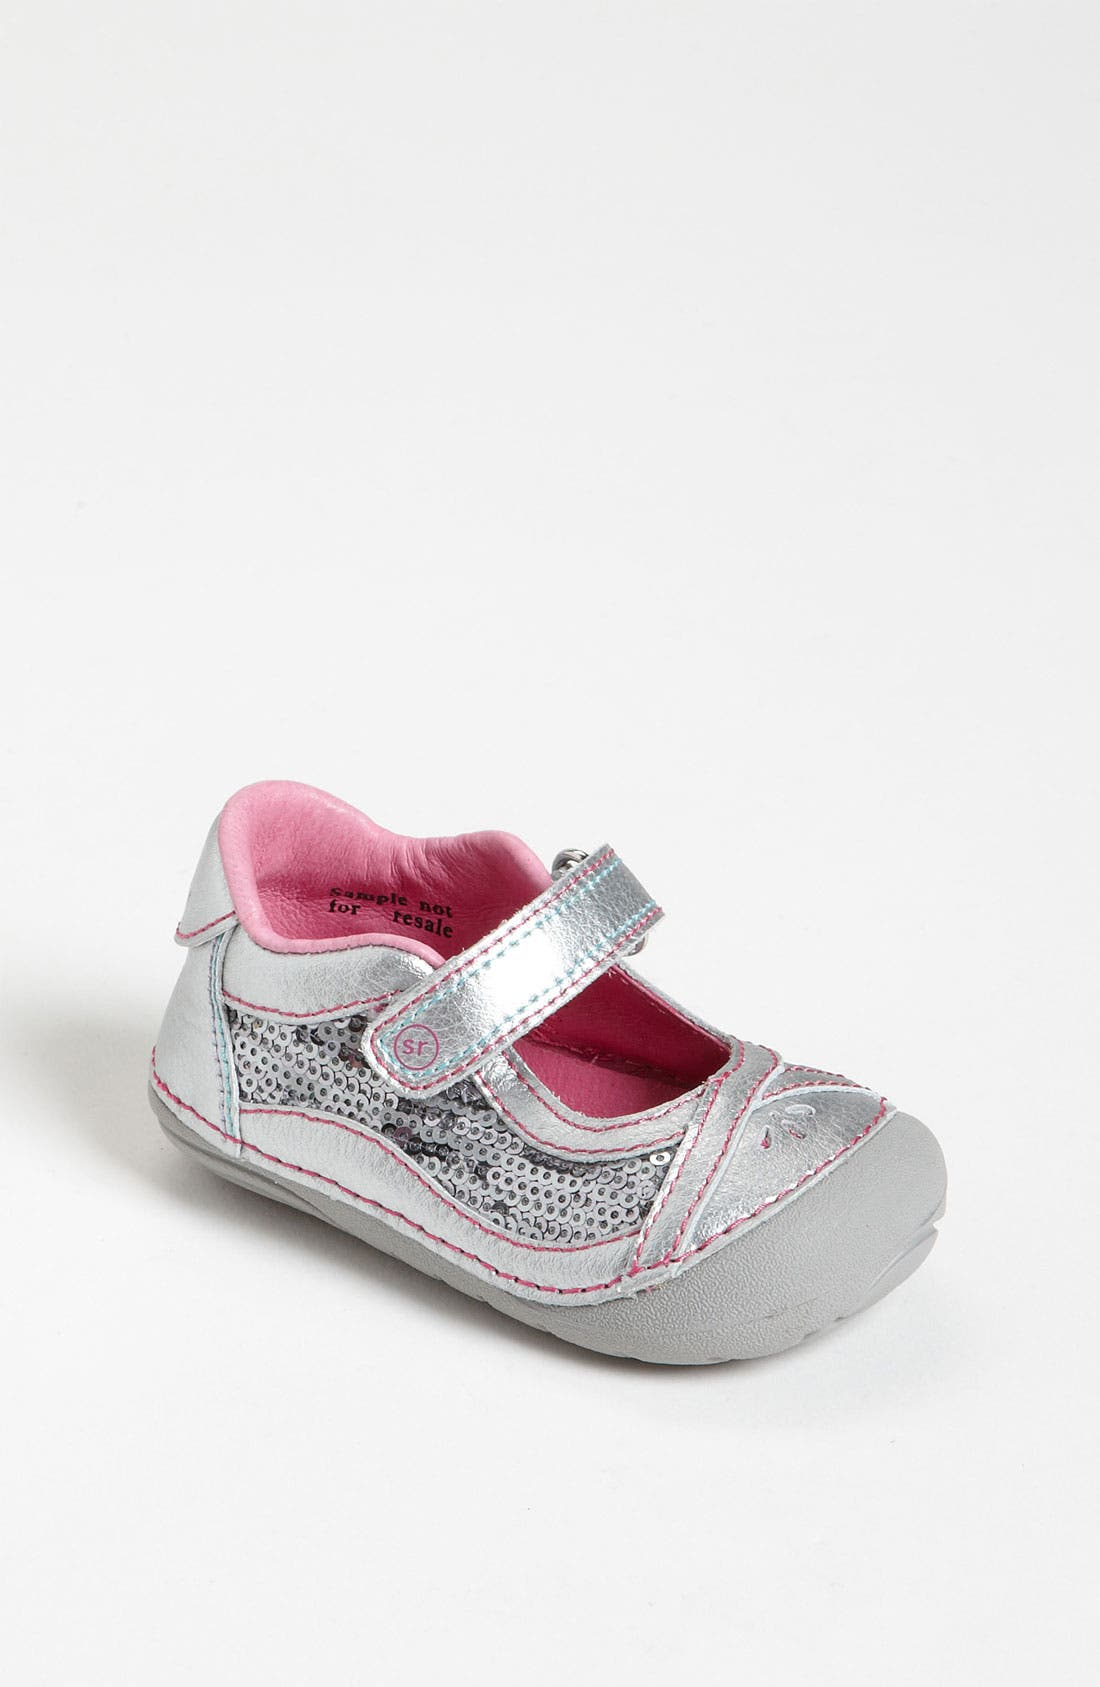 Main Image - Stride Rite 'Dream Queen' Sneaker (Baby & Walker)